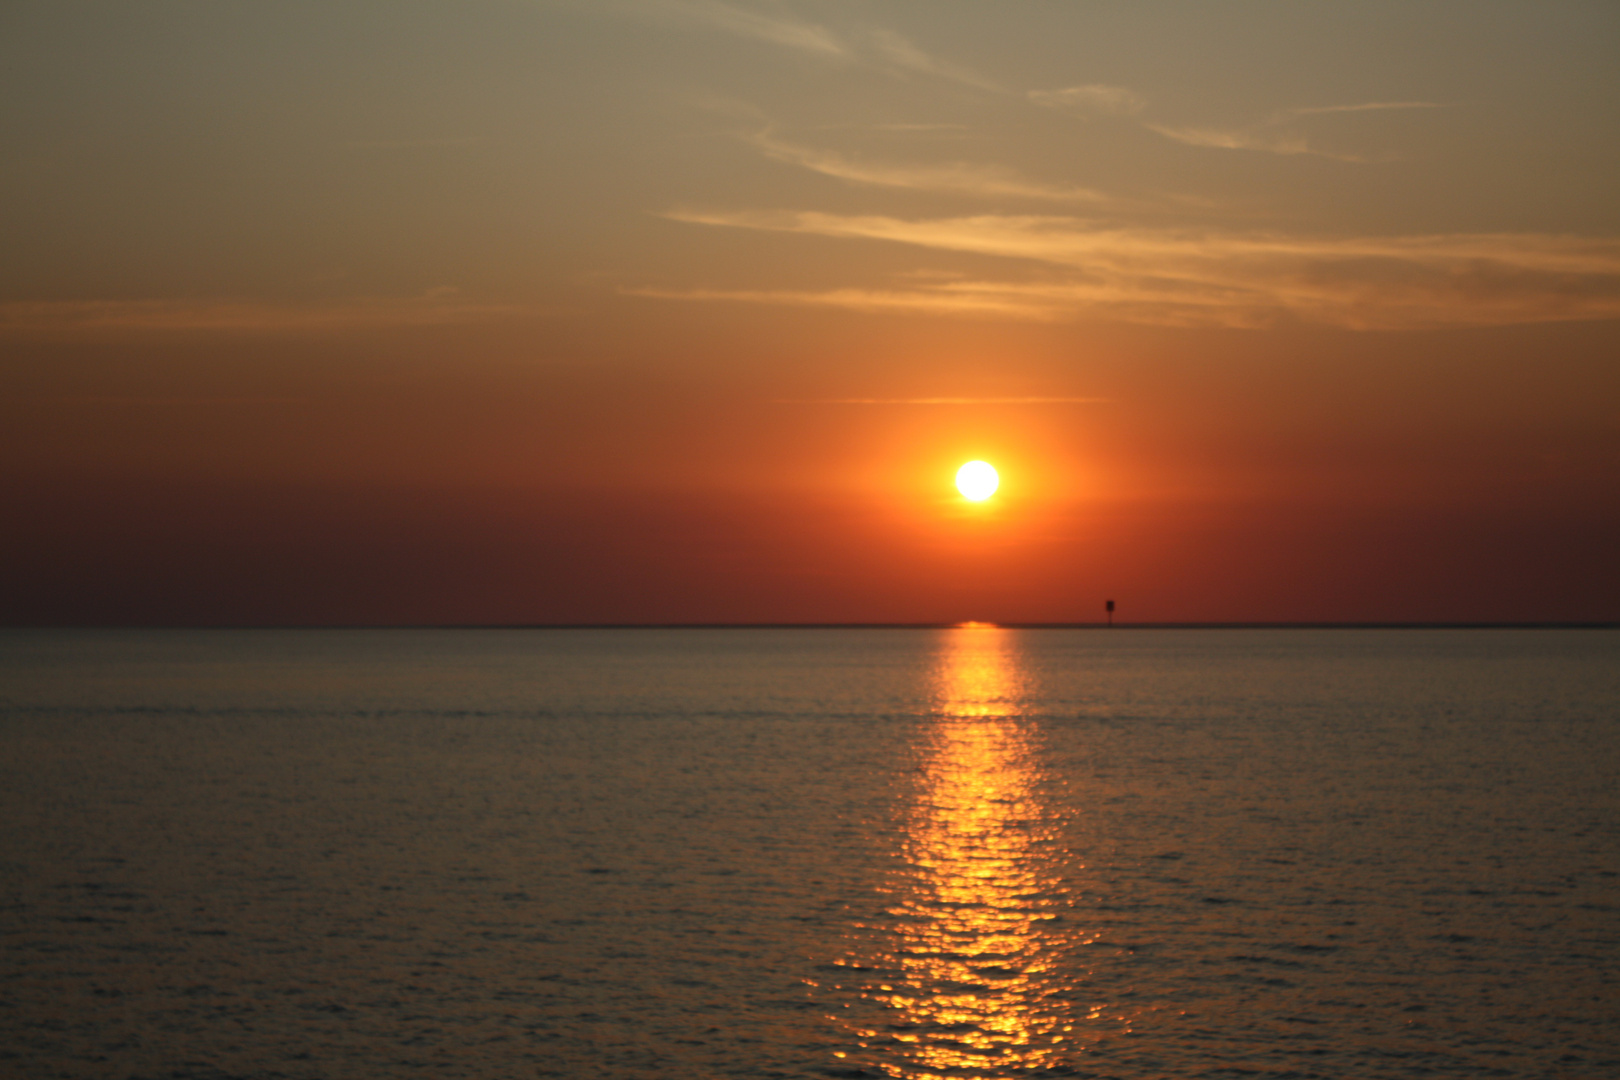 SOLEIL COUCHANT / Sonnenuntergang BÜSUM NORDSEE.